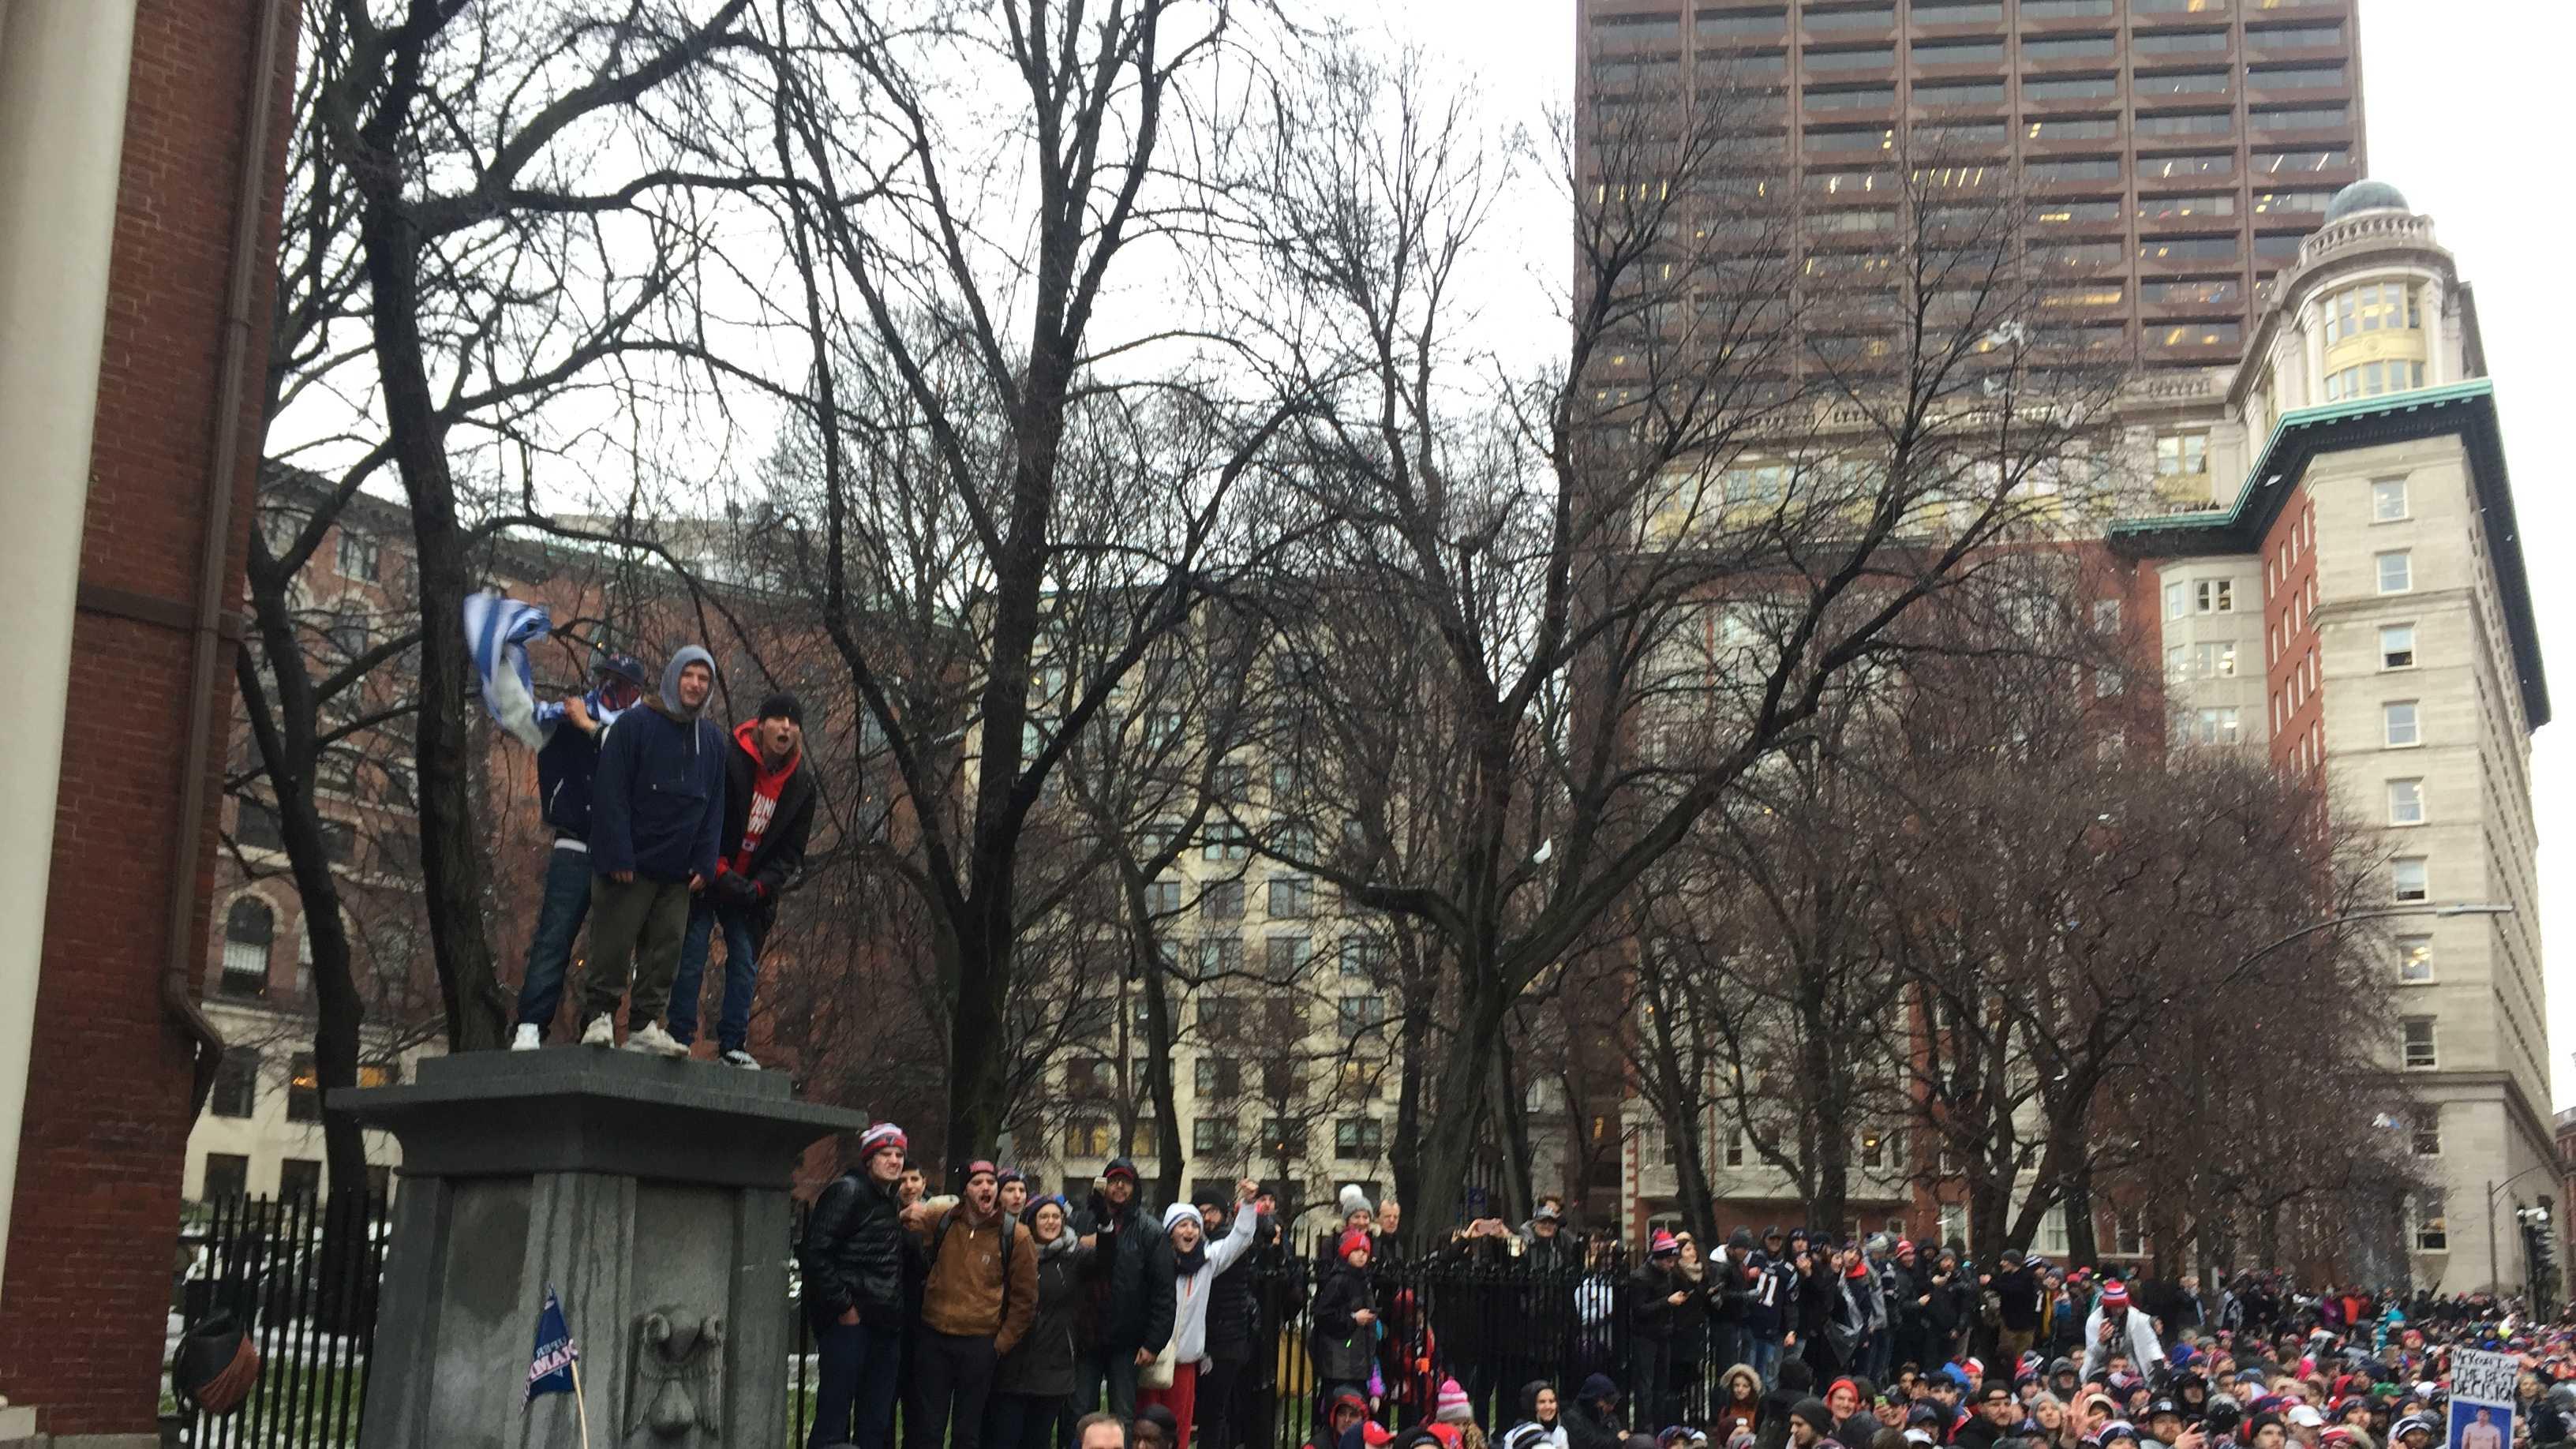 Patriots parade